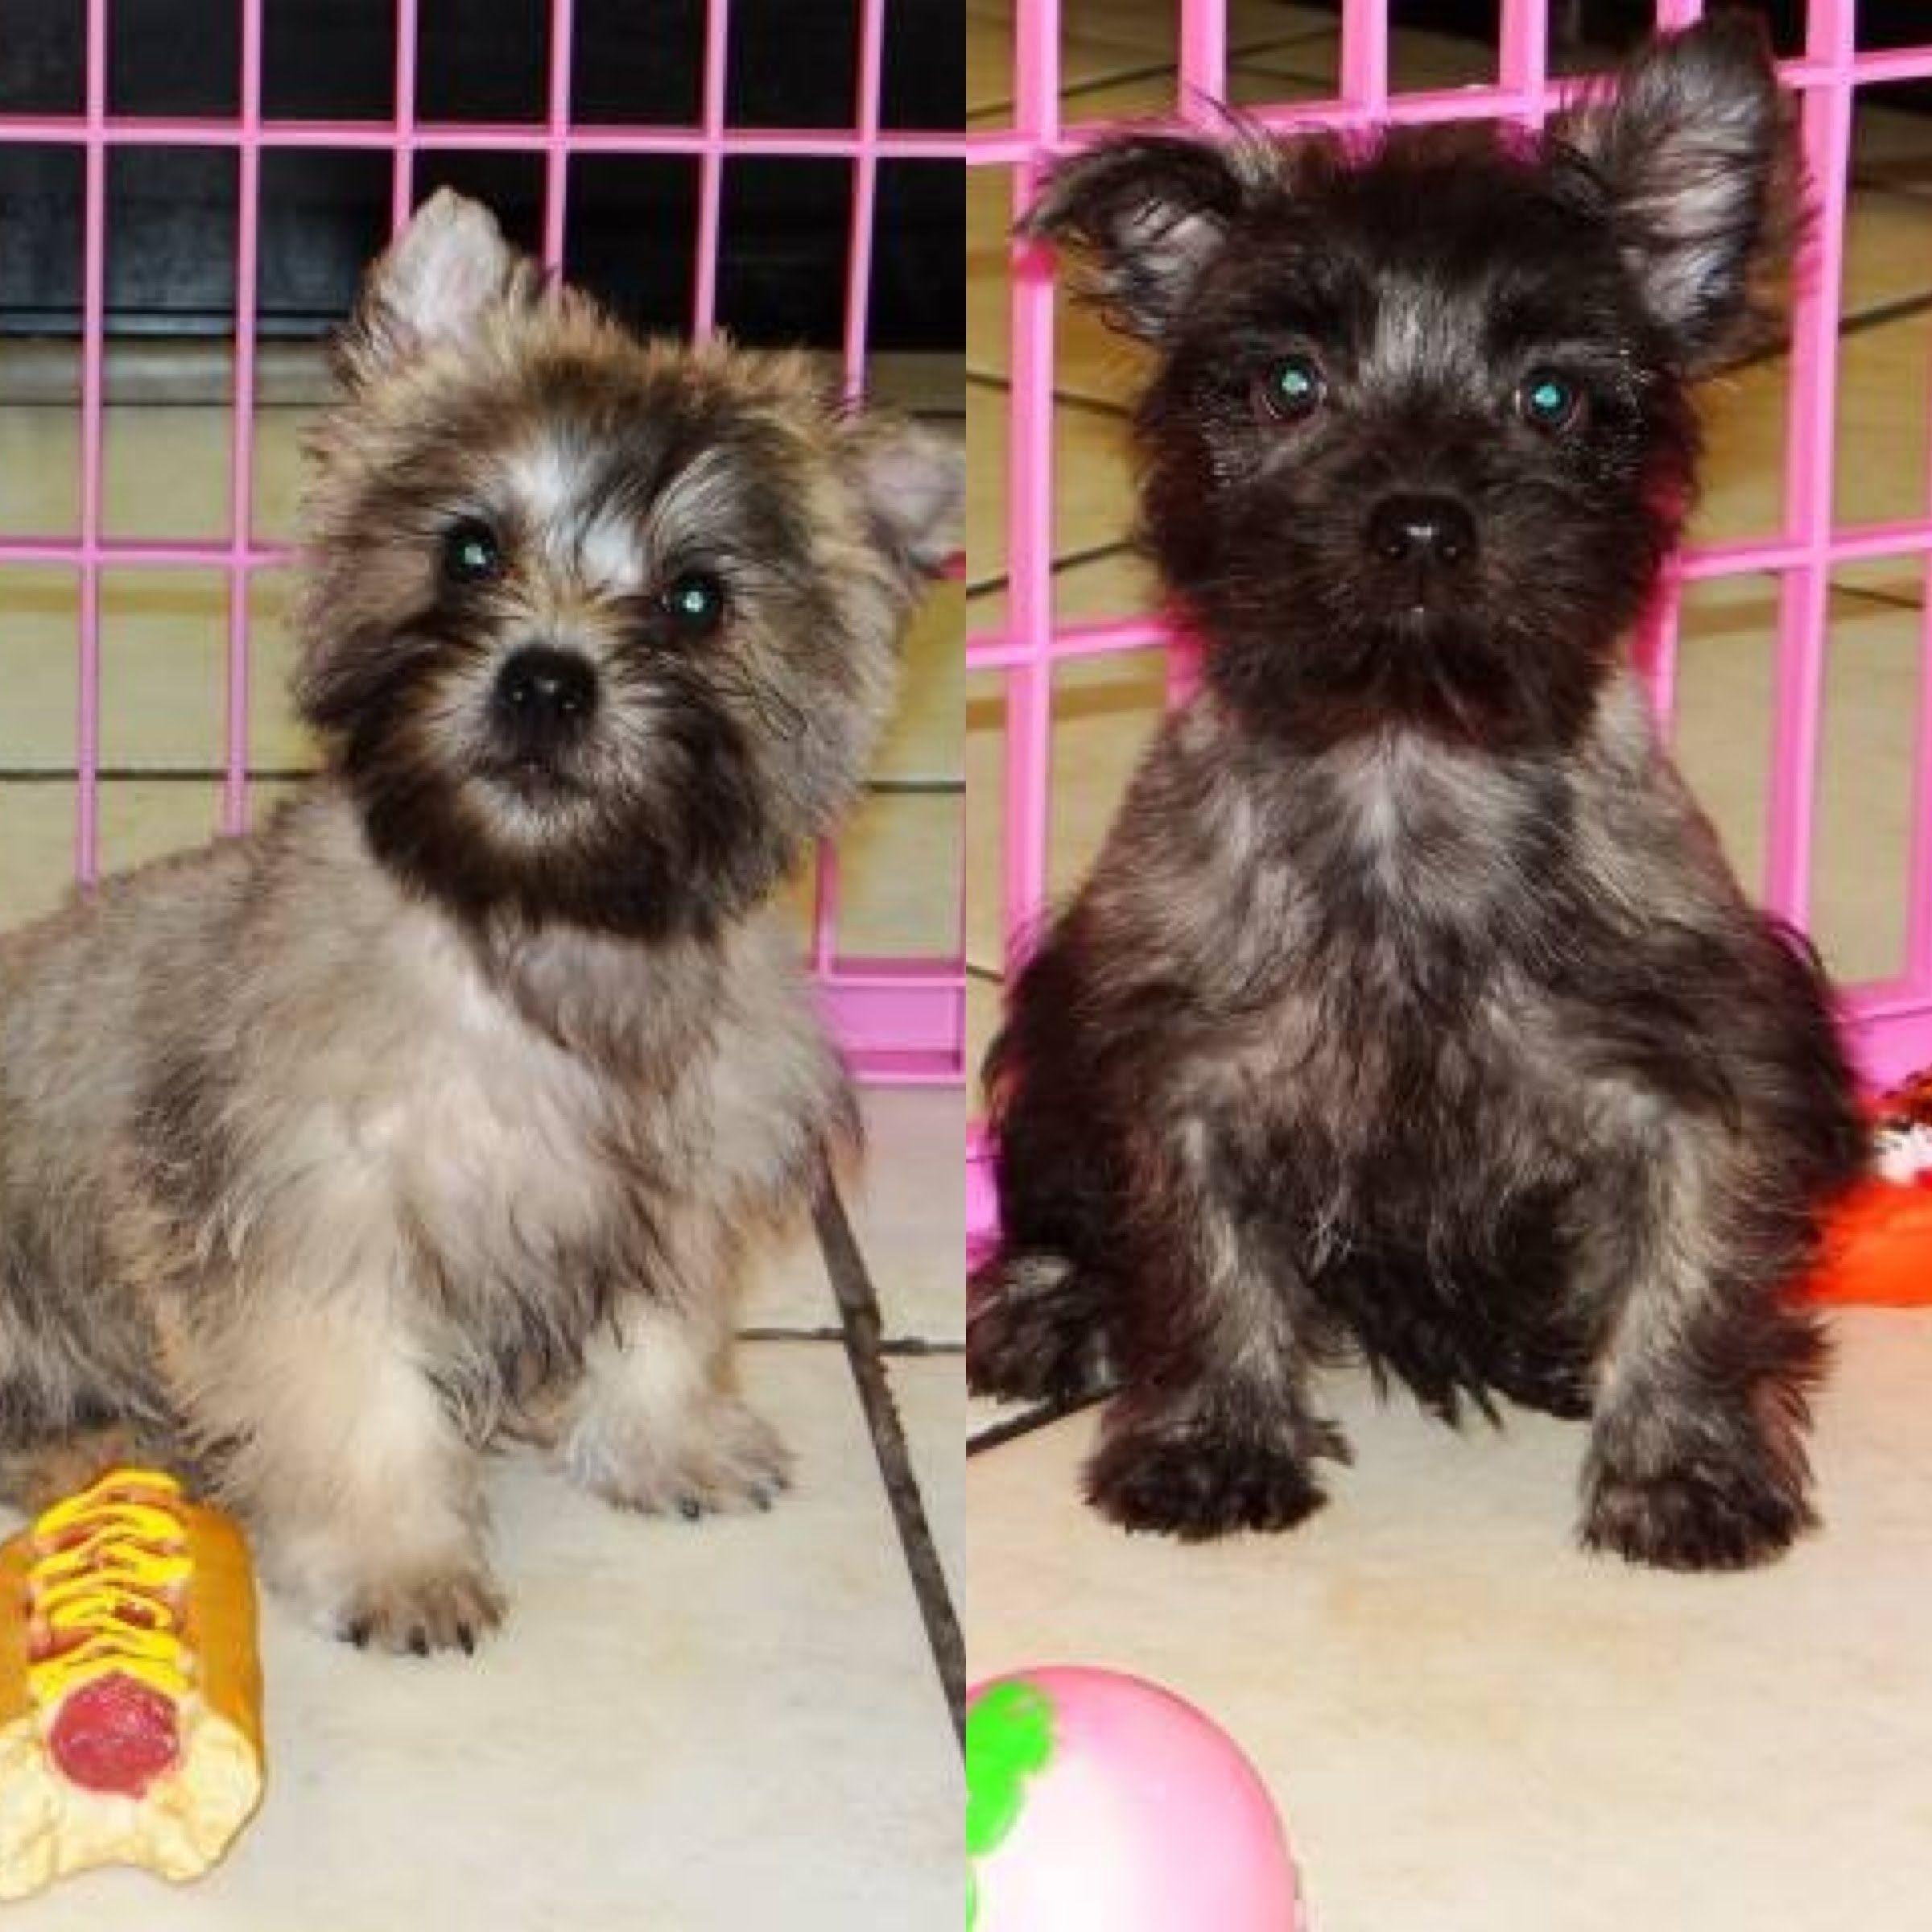 Cairn Terrier Puppies For Sale In San Jose California Ca Ontario Santa Rosa Rancho Cucamon Cairn Terrier Puppies Cairn Terrier Terrier